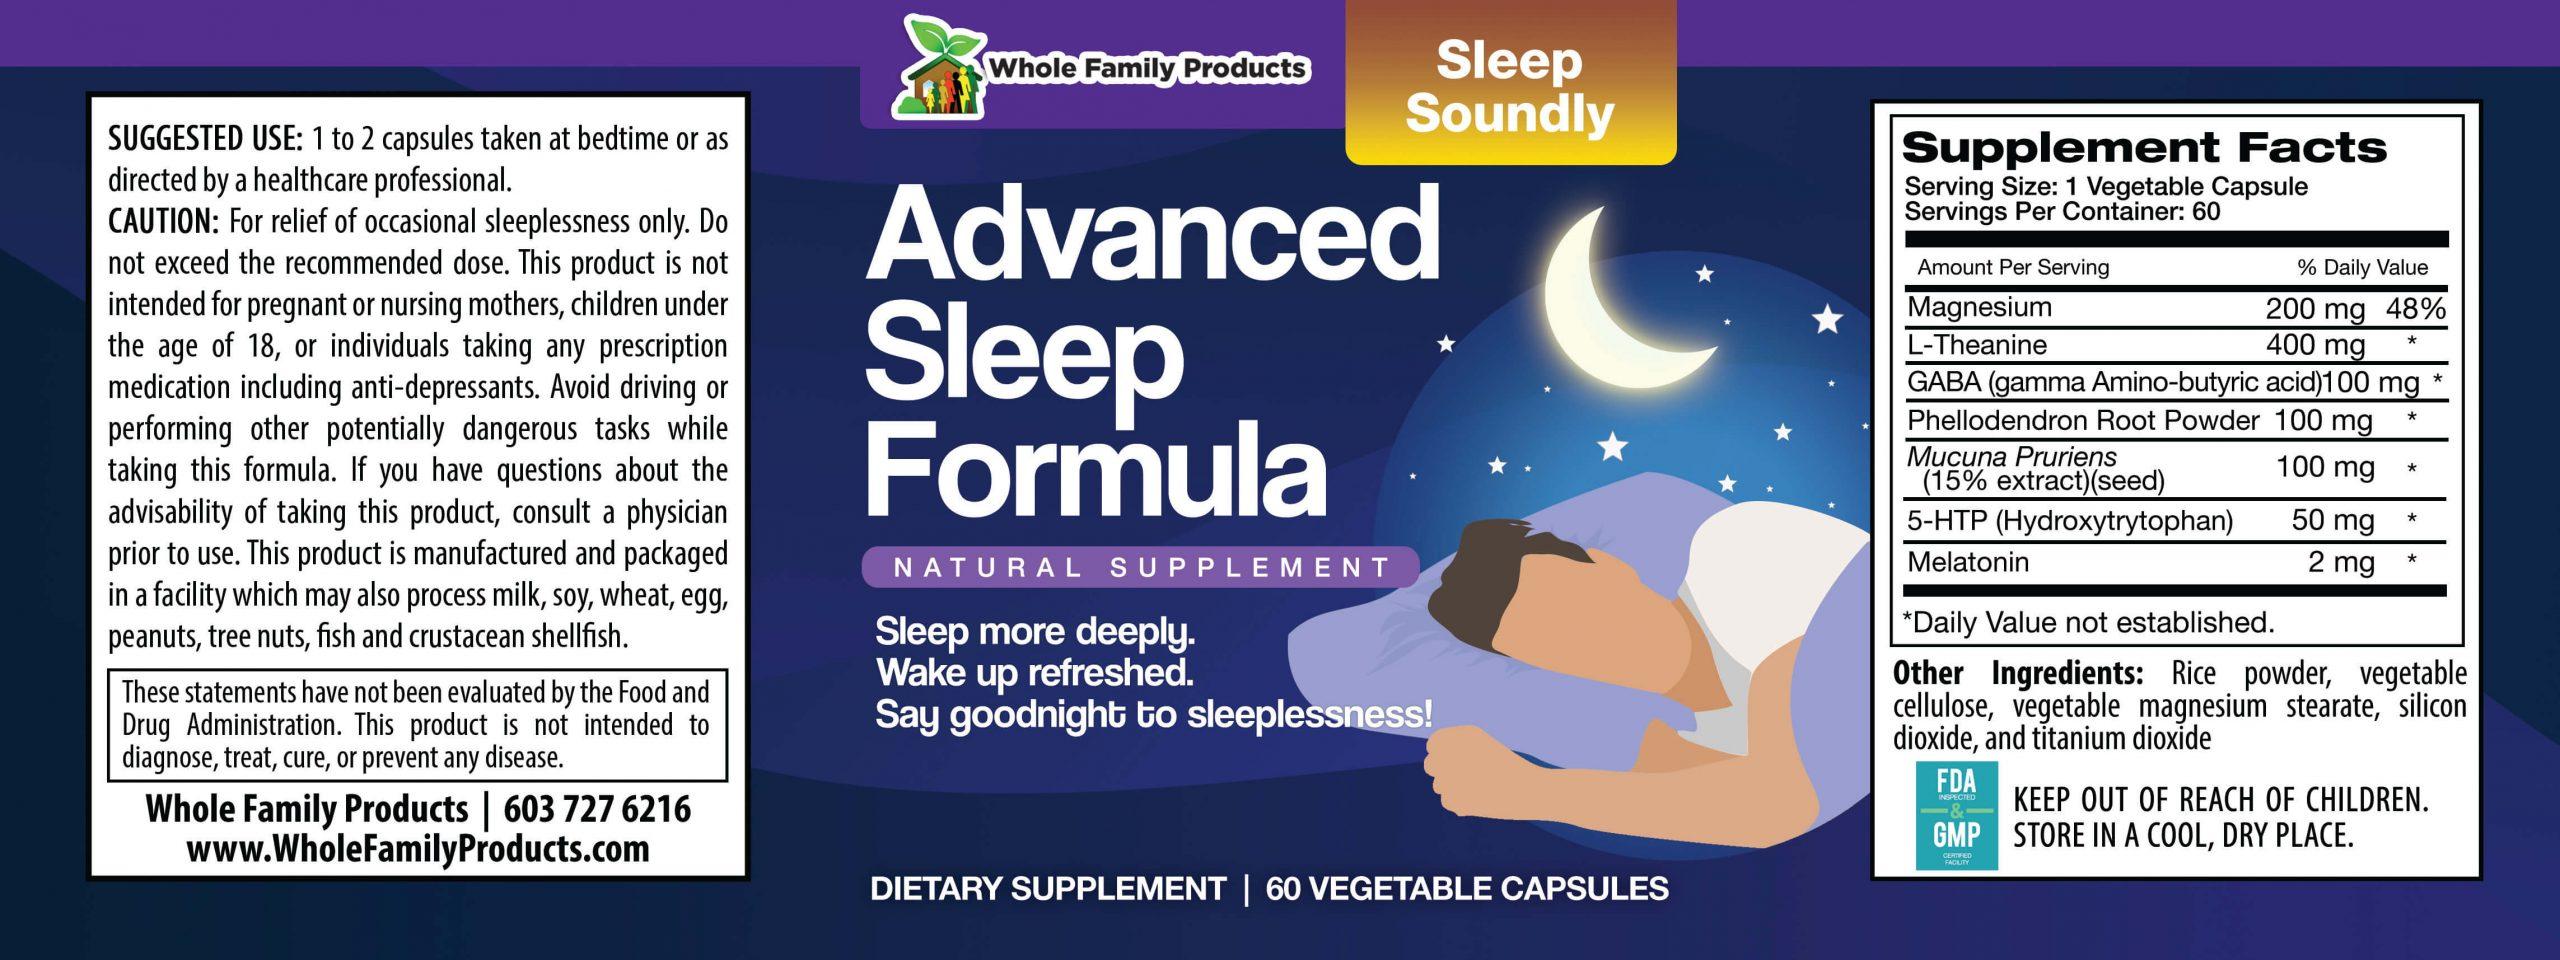 Advanced Sleep Formula 60ct WFP Product Label